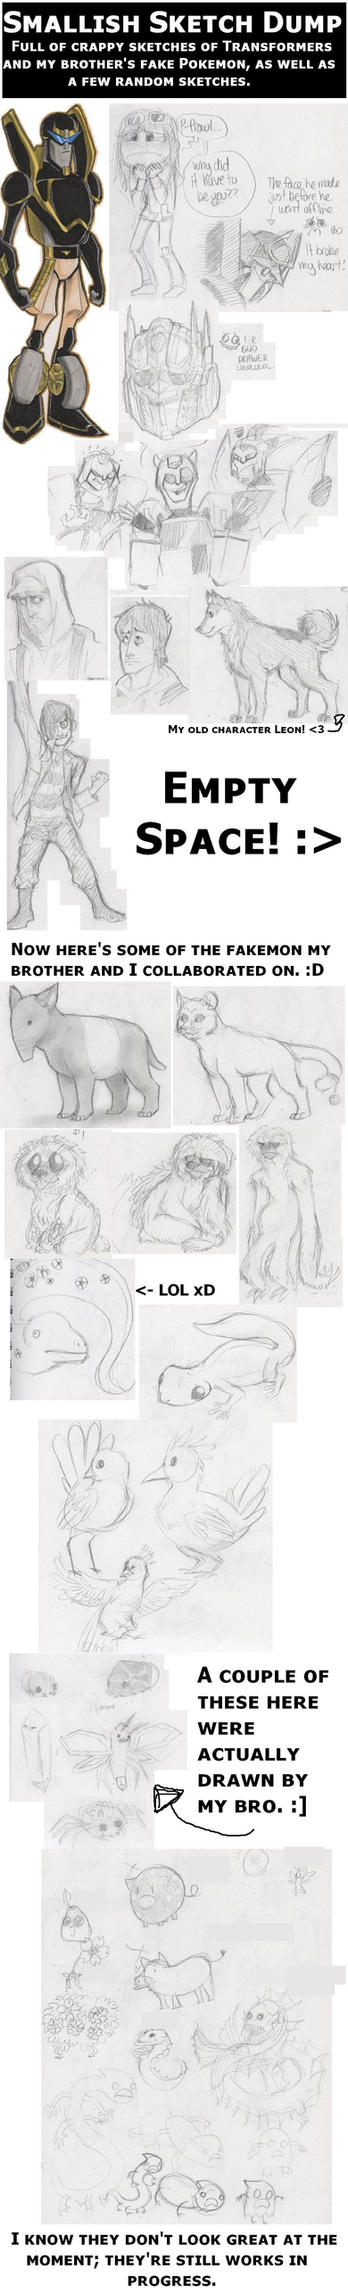 Yet Another Sketch Dump by NekoNikora